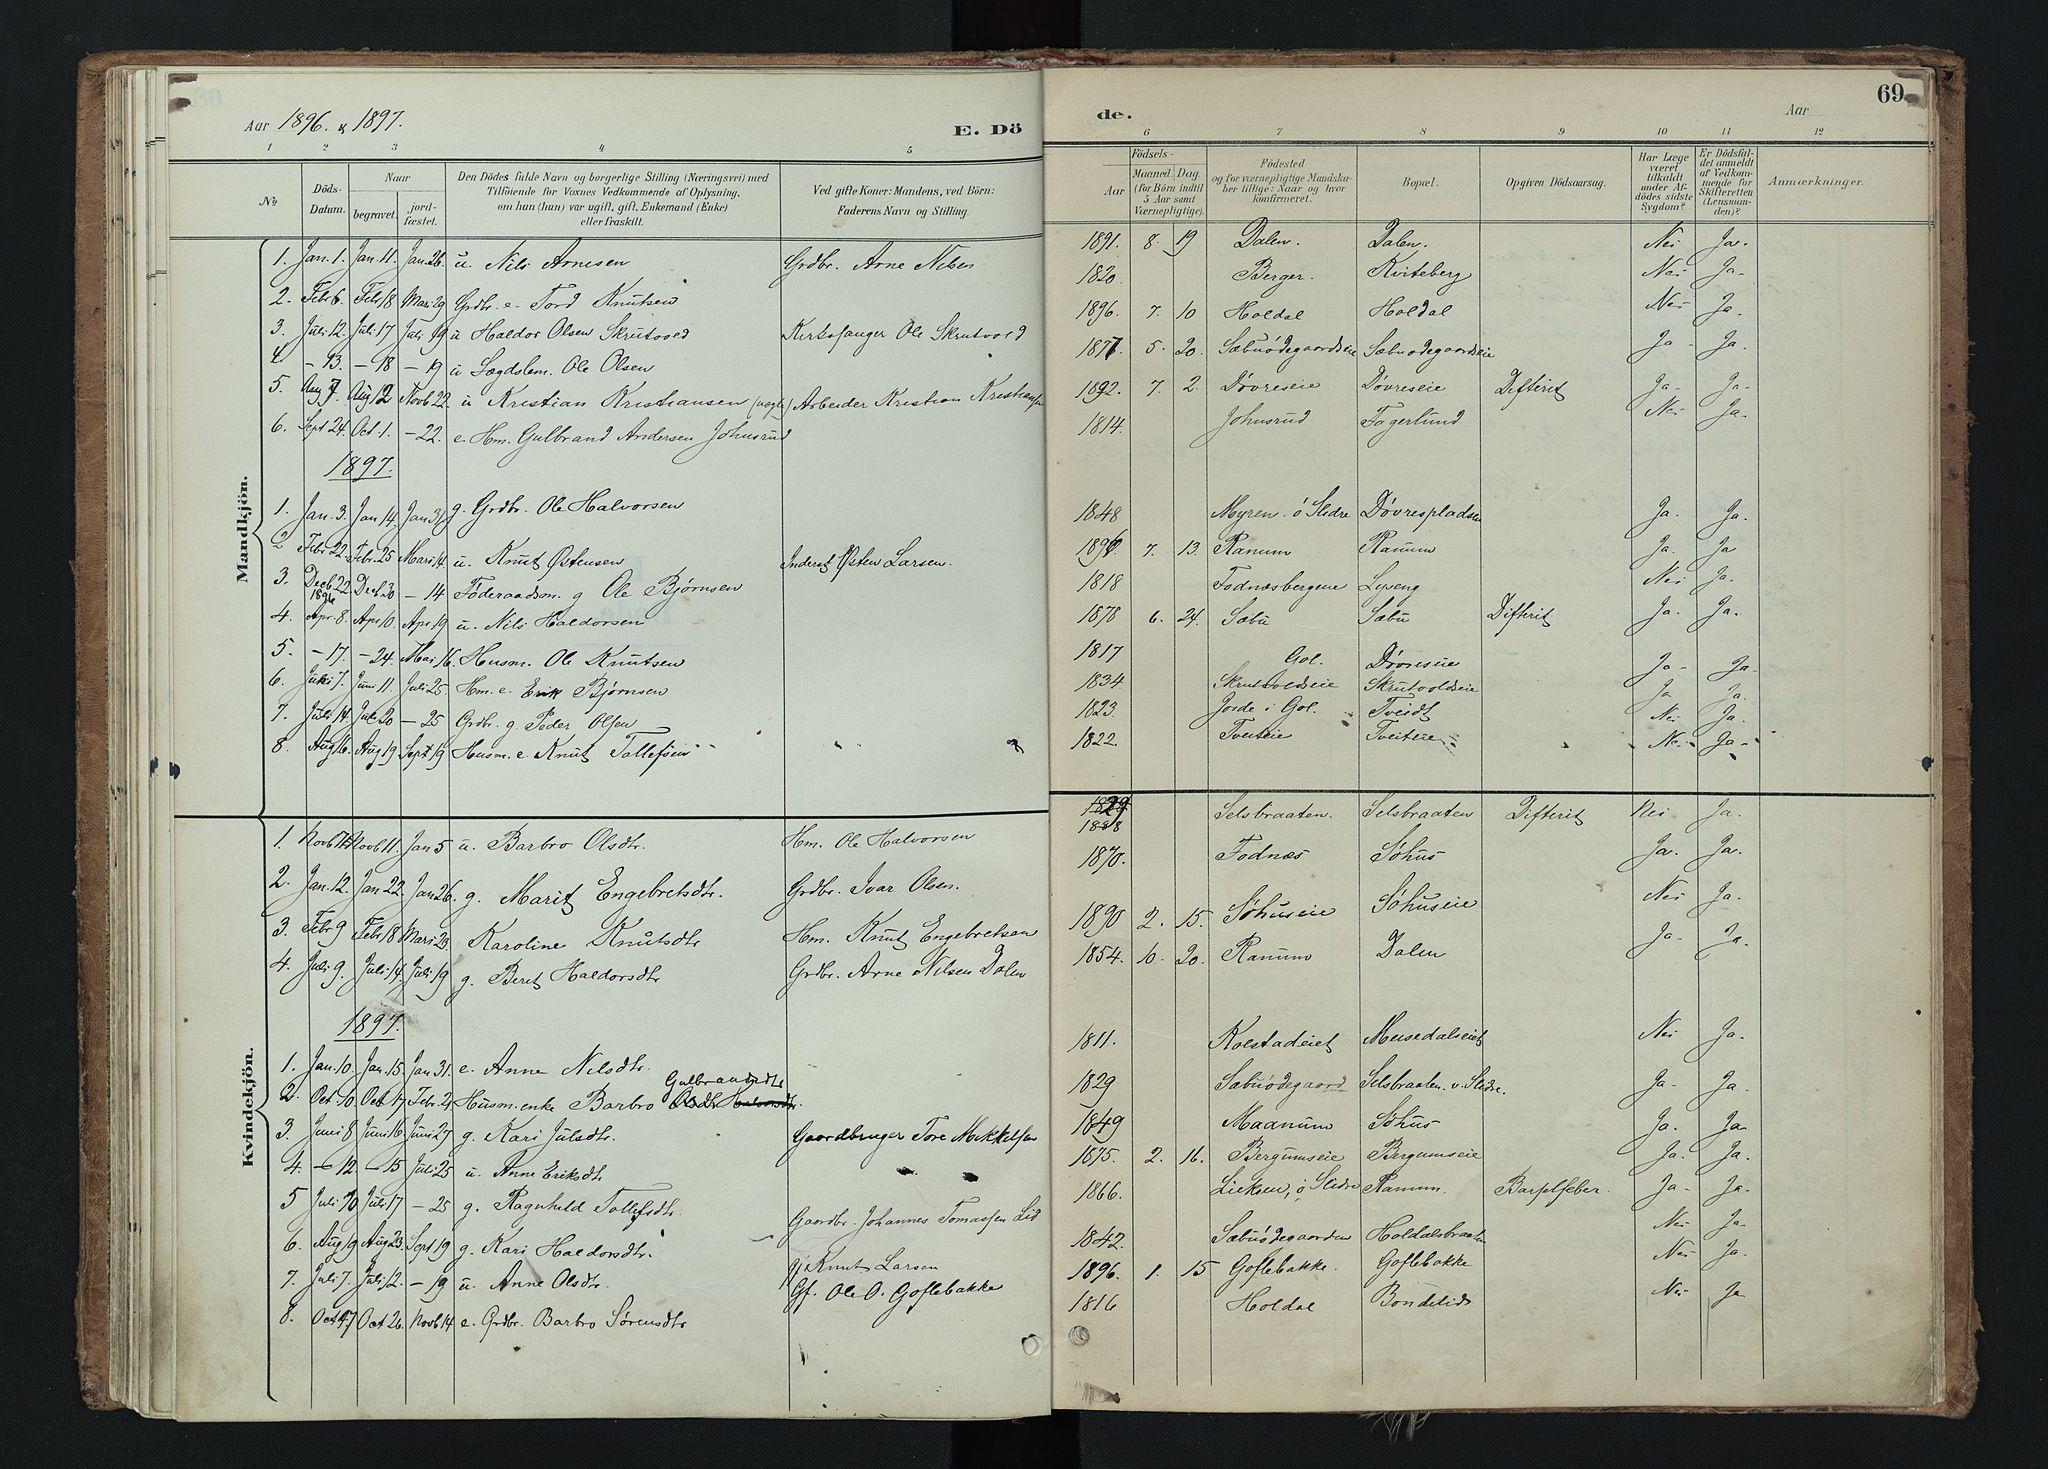 SAH, Nord-Aurdal prestekontor, Ministerialbok nr. 15, 1896-1914, s. 69